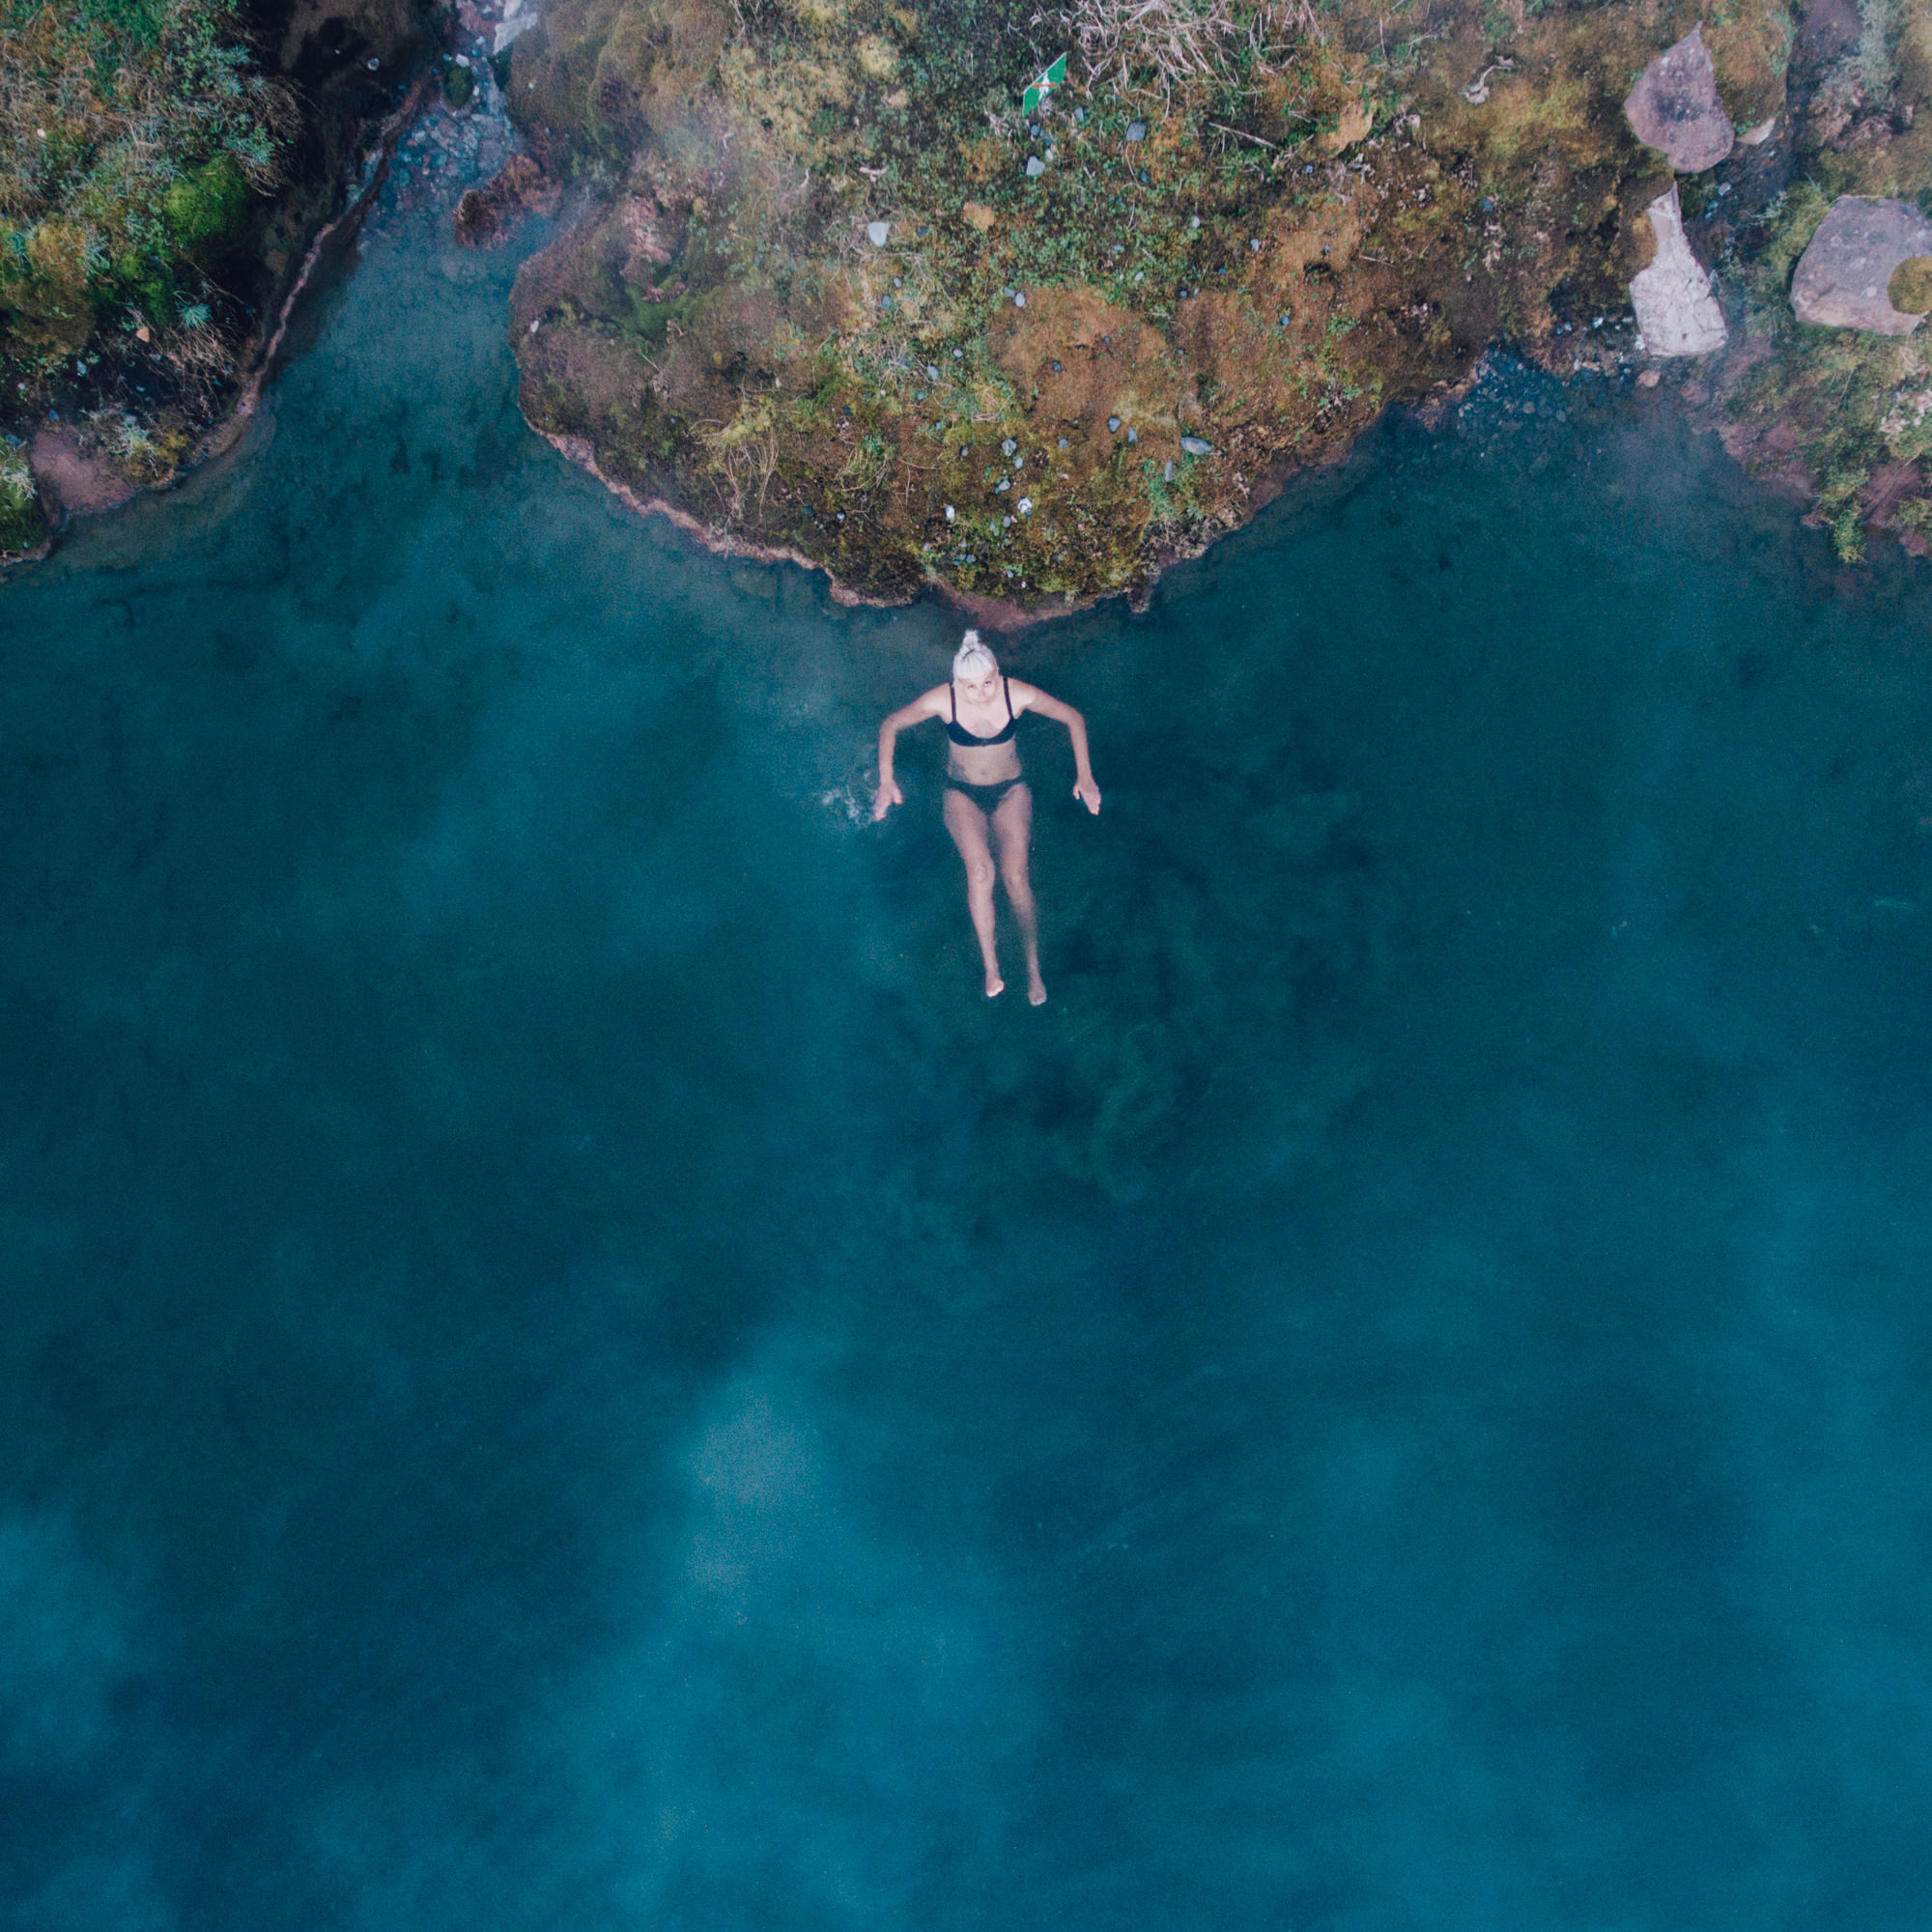 wrenee-iceland-part-1-15-secret-lagoon-drone.jpg